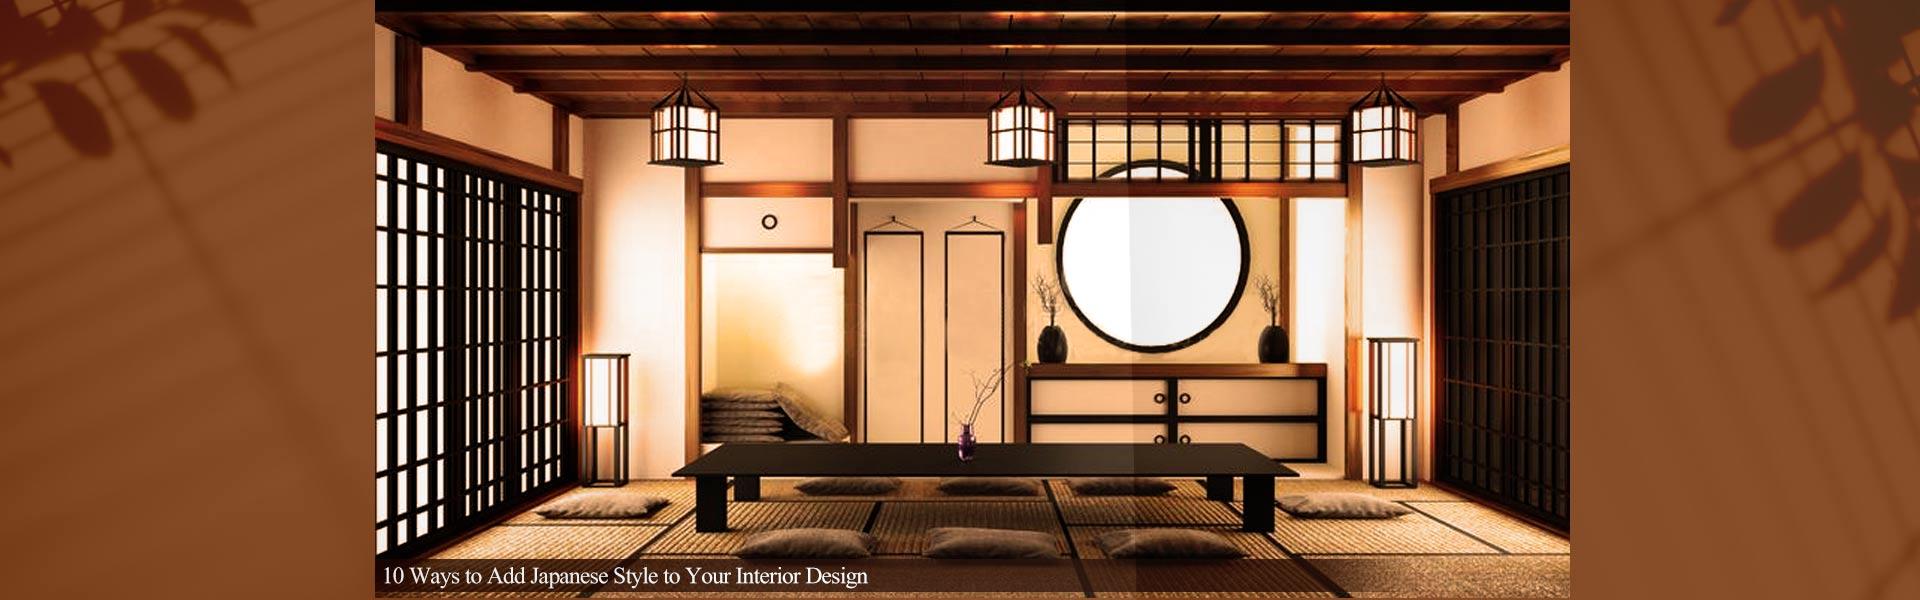 Japanese style 0a - طراحی دکوراسیون داخلی به سبک ژاپنی ها